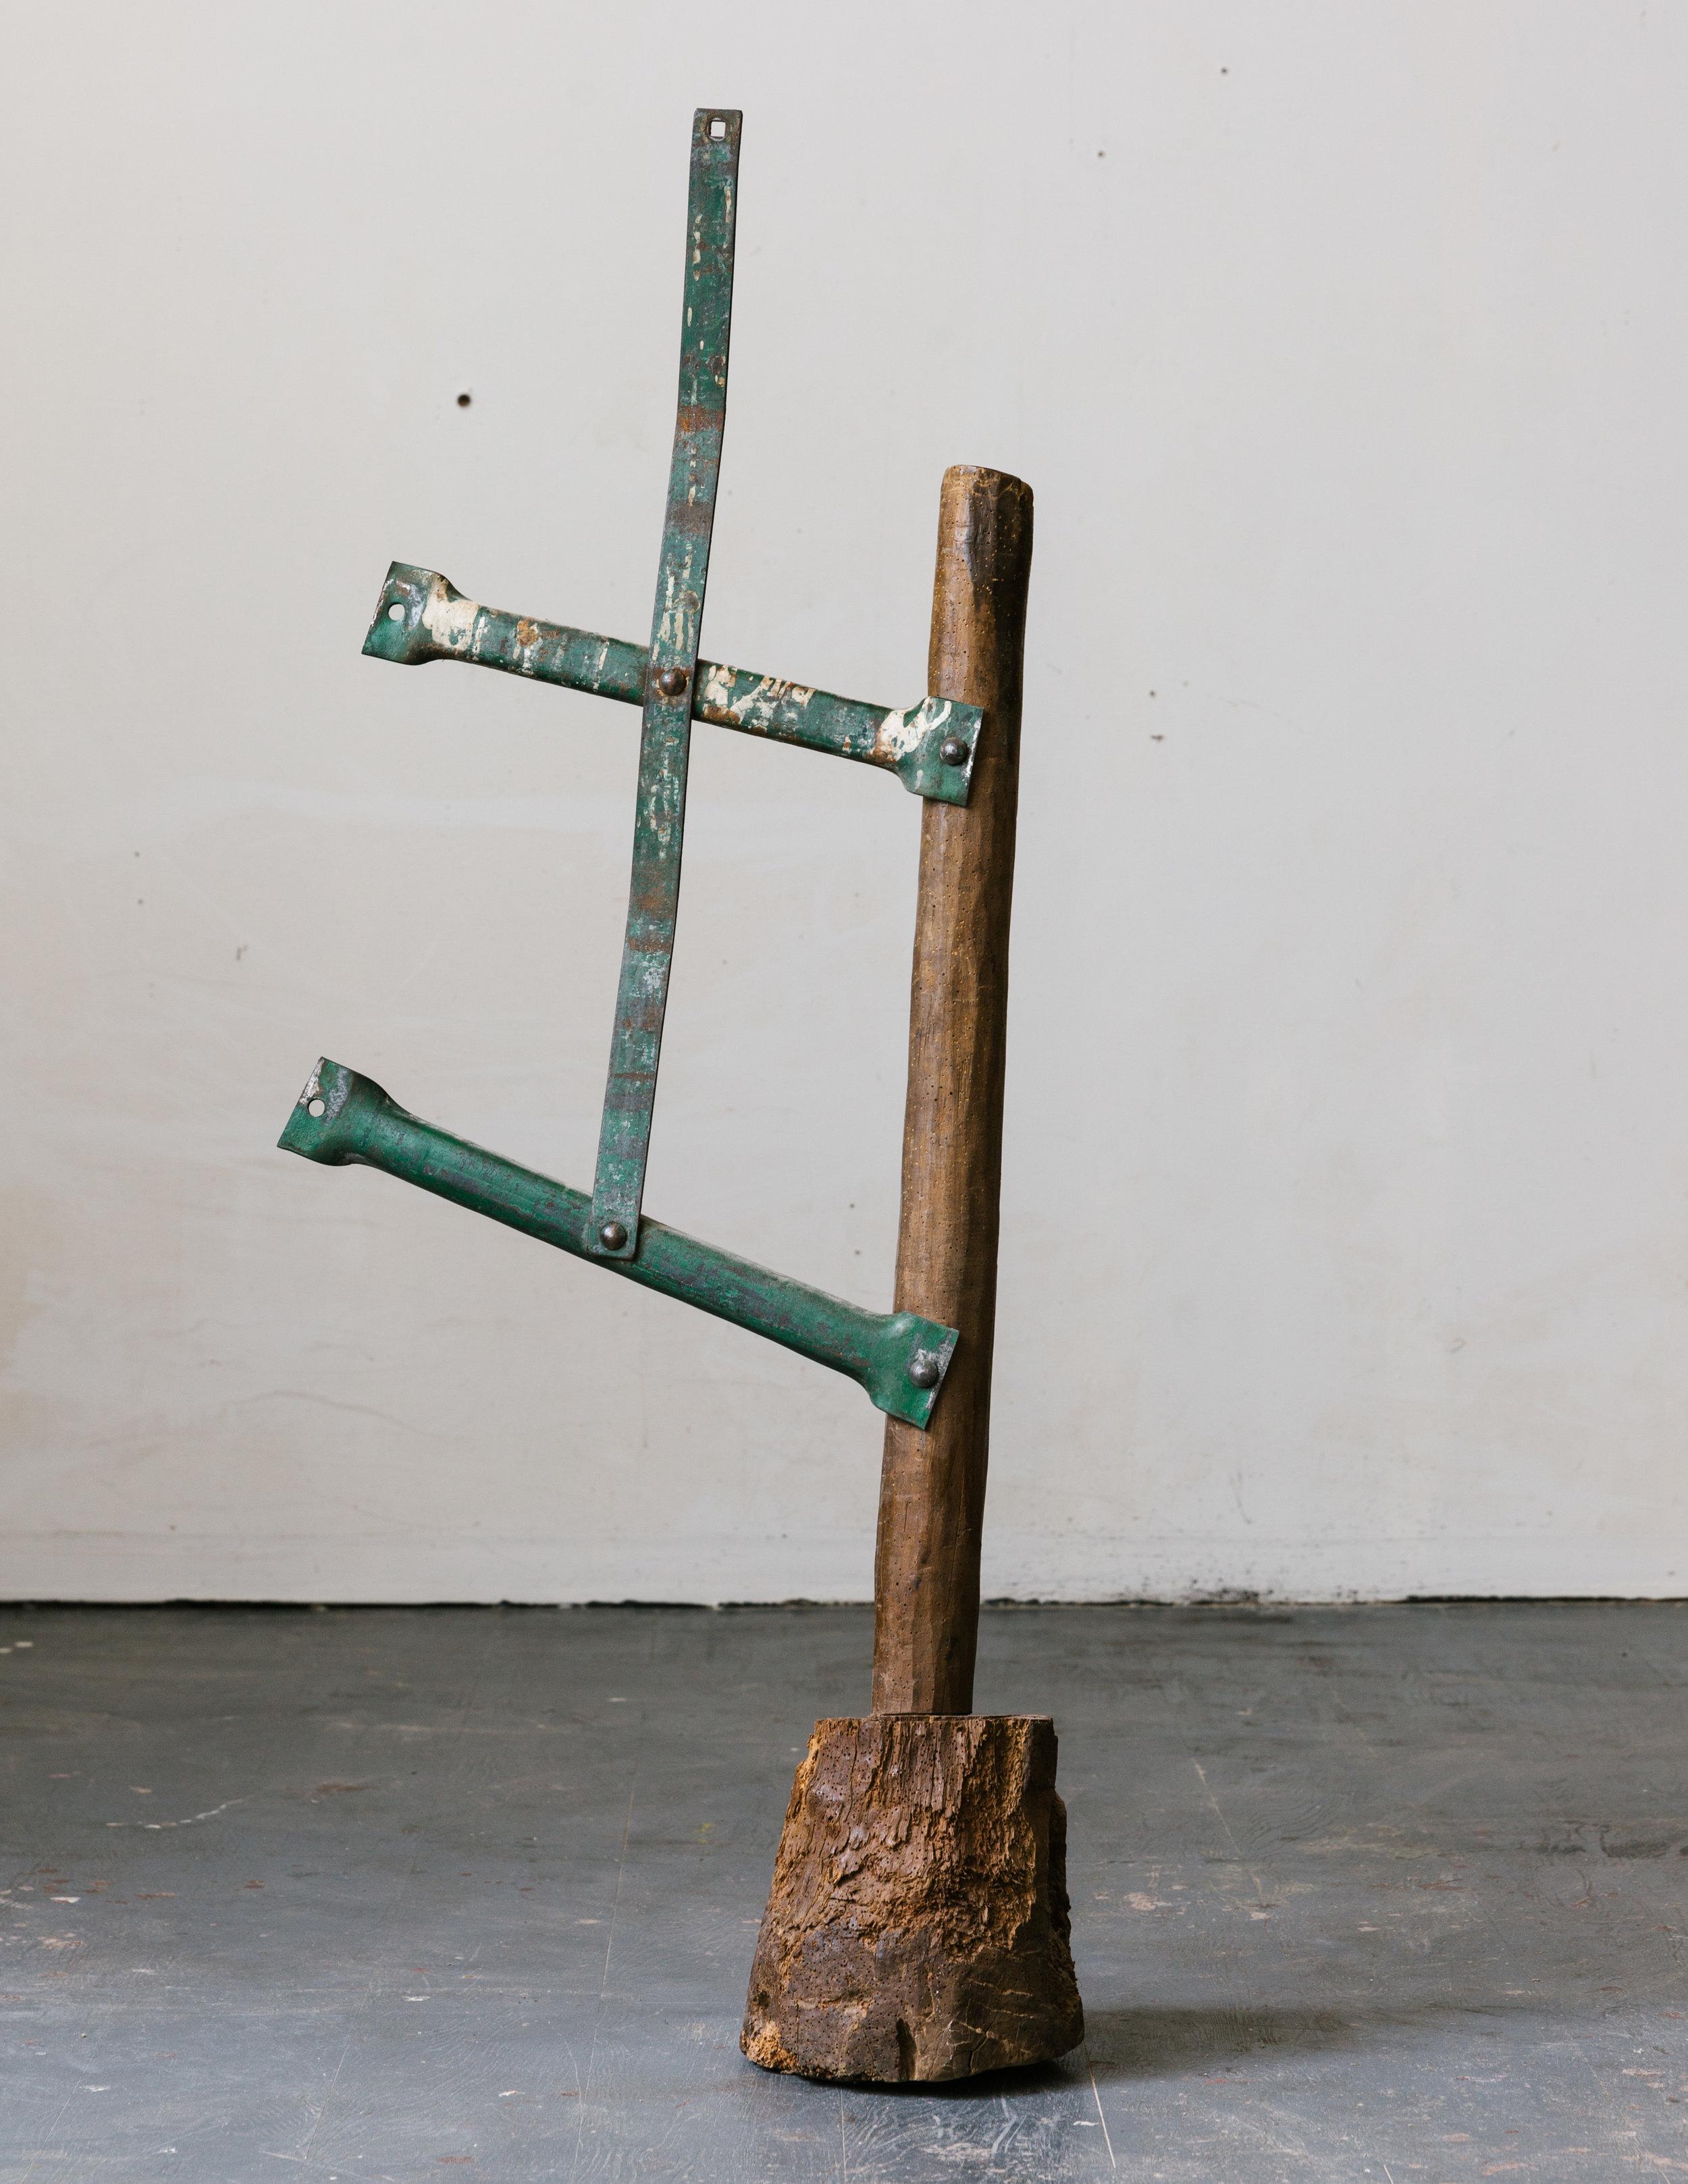 Hahn da Rosa | Wood, metal, hardware, 2018, 39 x 21 x 8 inches